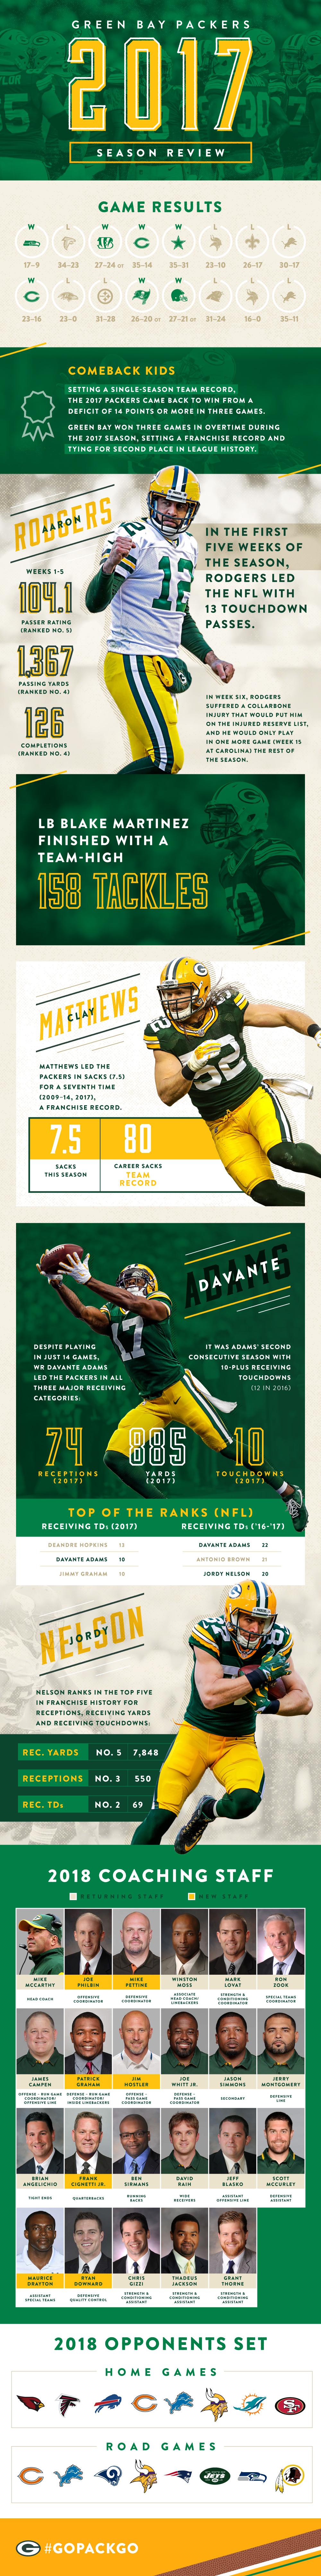 2017 Packers Season Review